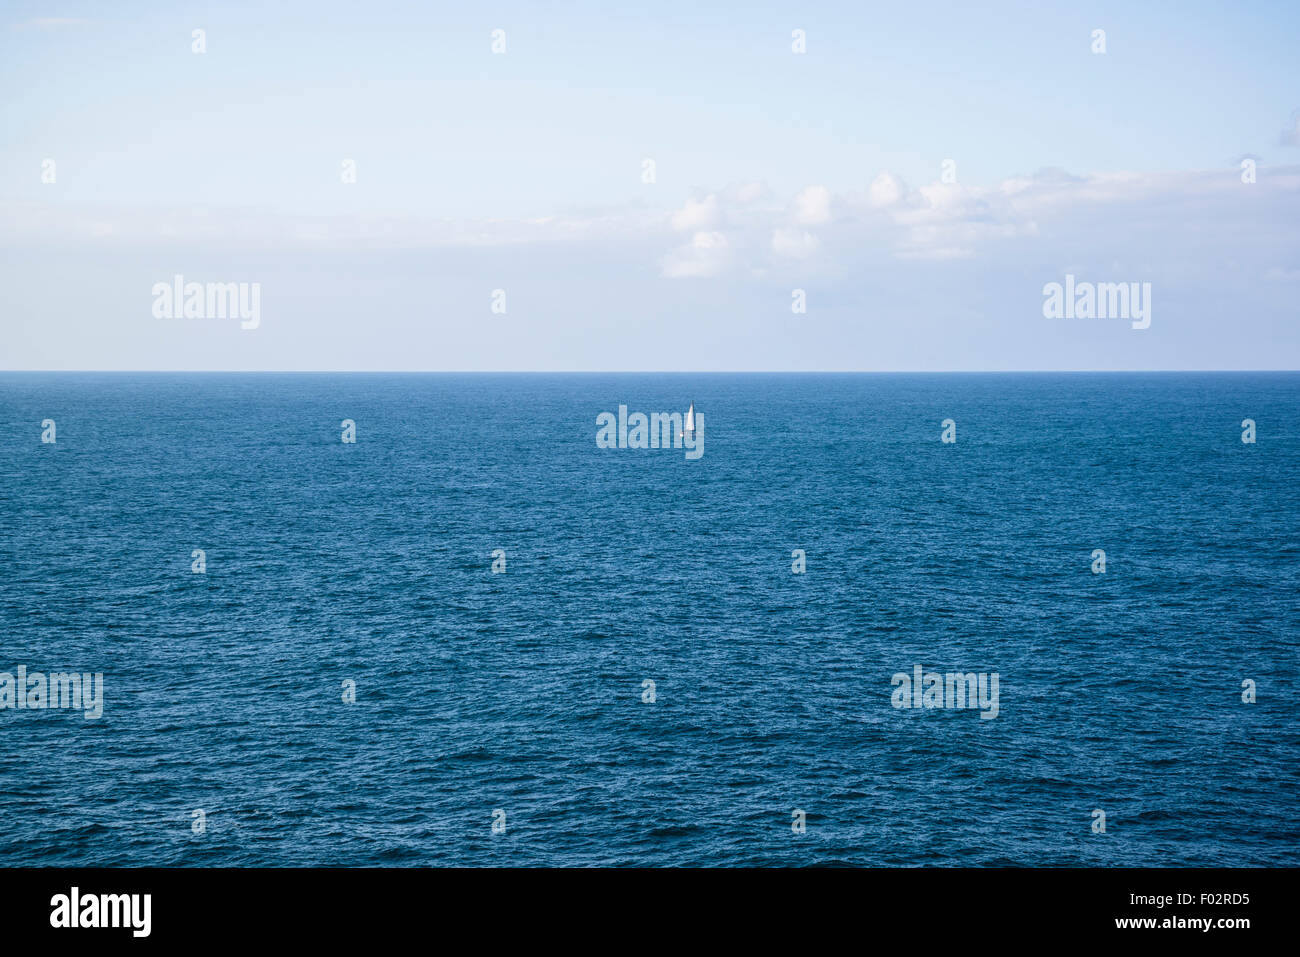 Sailing boat, Watson Bay, The Gap Bluff, Sydney, Australia - Stock Image